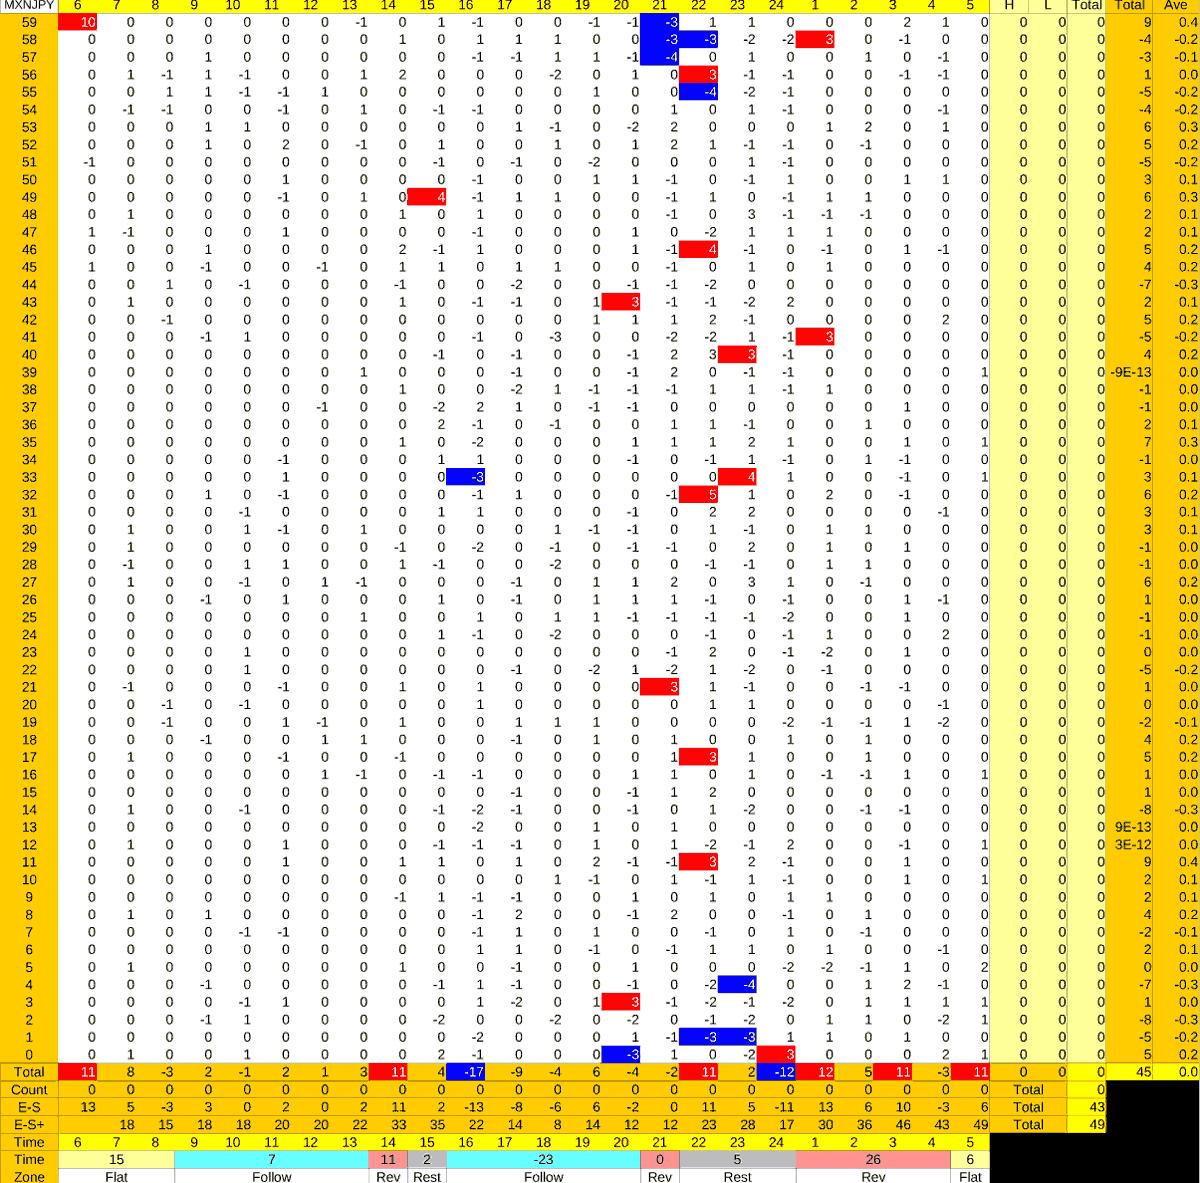 20210824_HS(3)MXNJPY